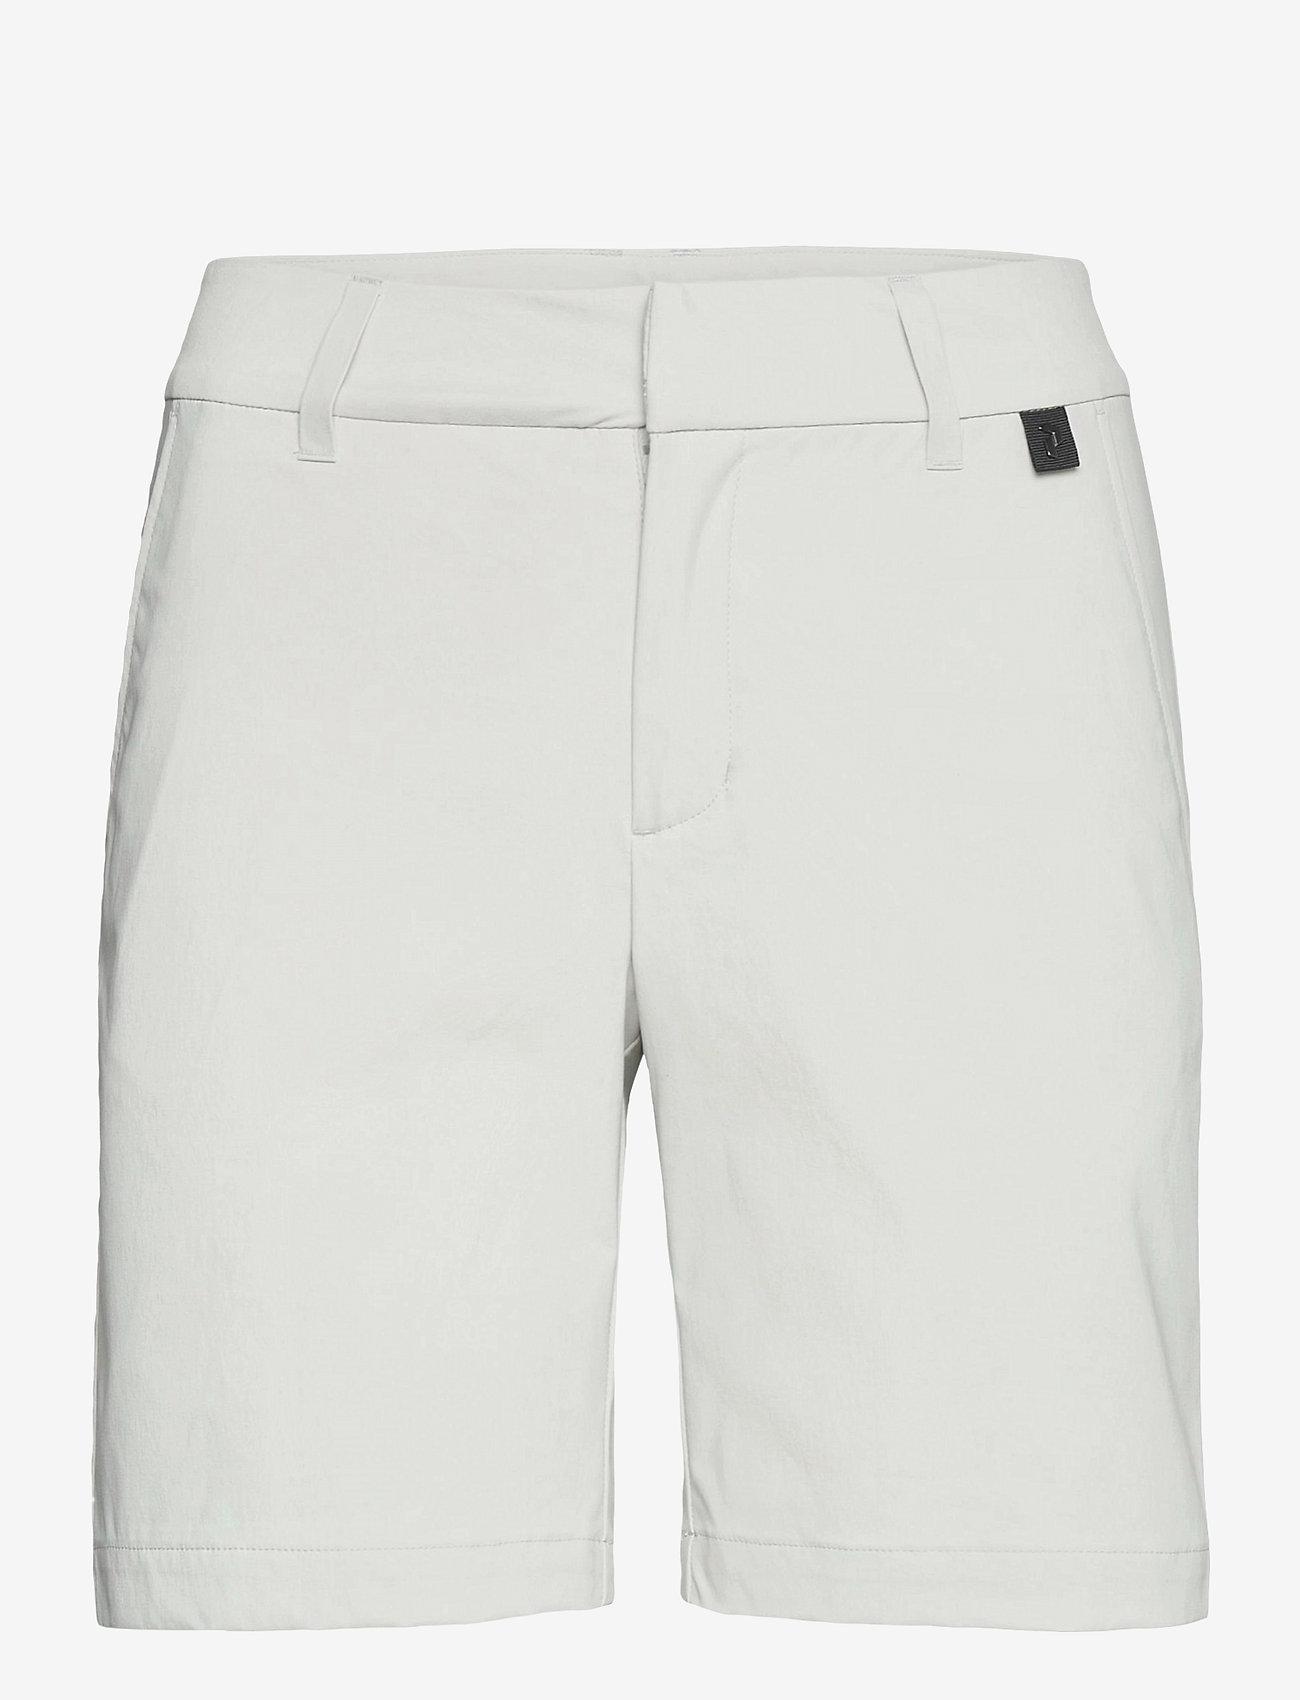 Peak Performance - W Illusion Shorts - wandel korte broek - antarctica - 0